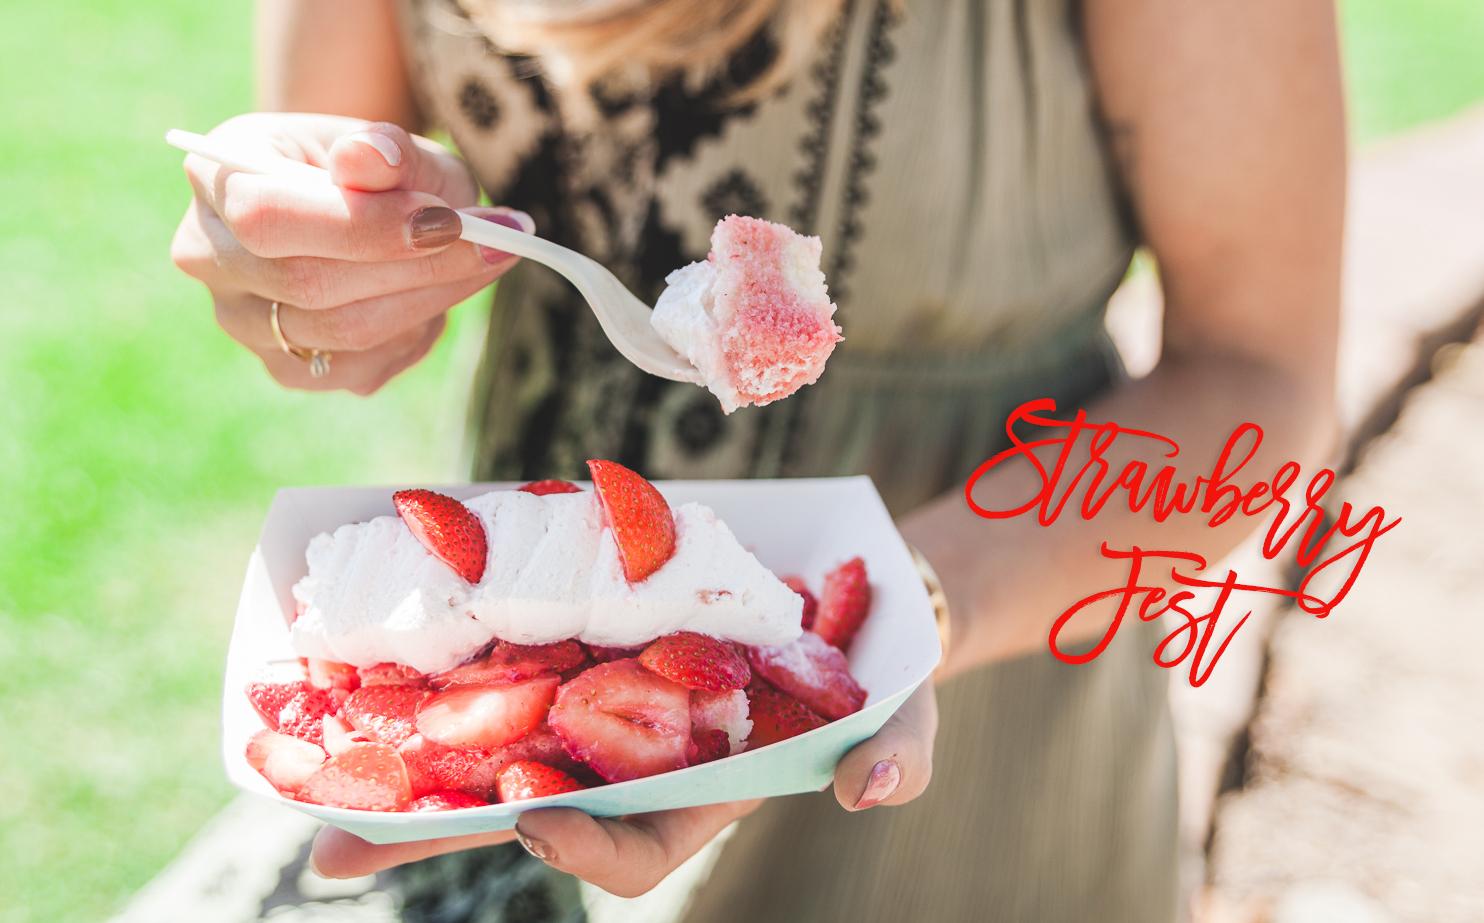 strawberry-fest-2